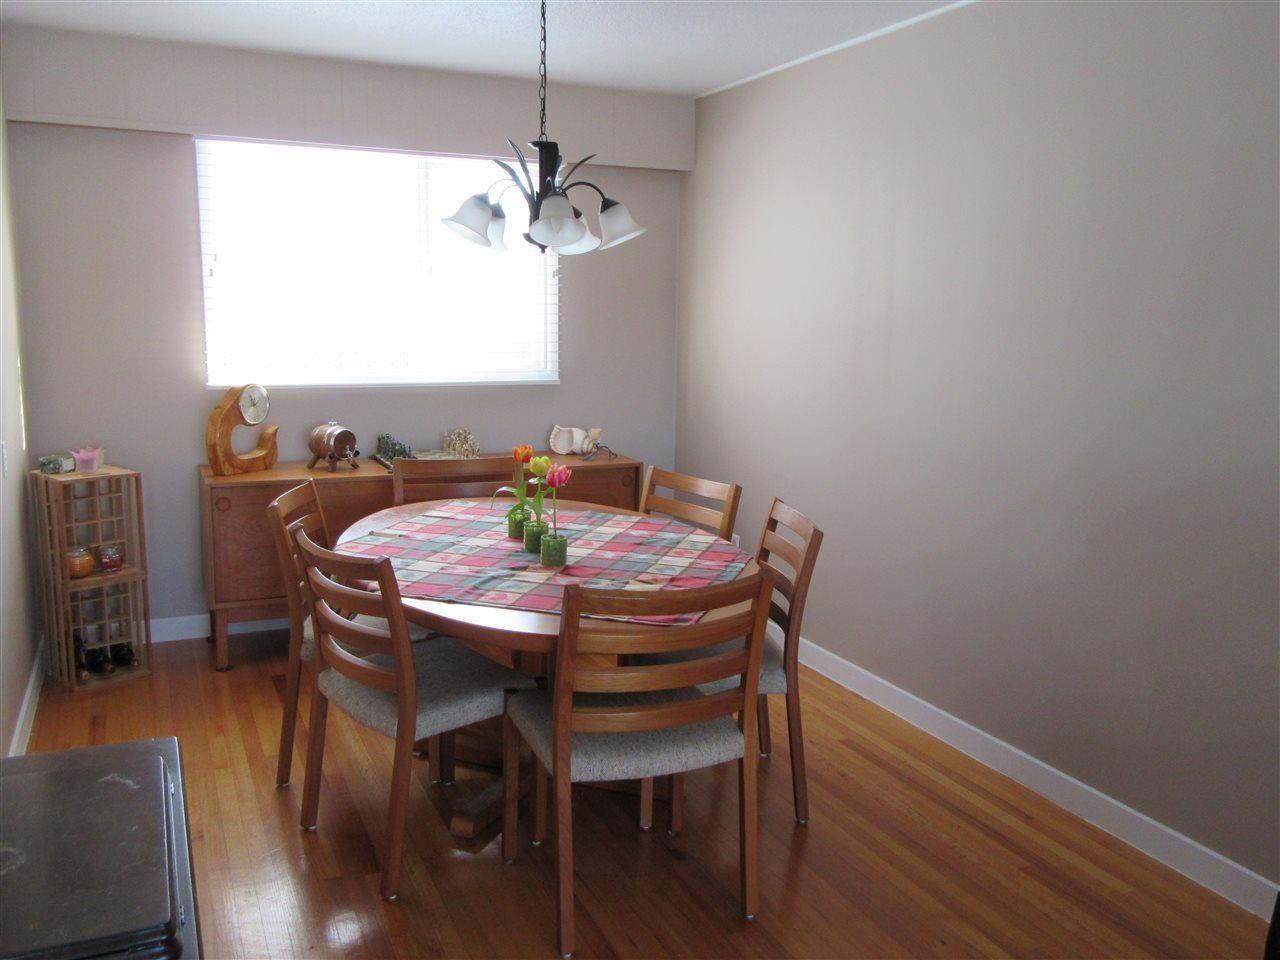 Photo 7: Photos: 522 RADCLIFFE Drive: Quinson House for sale (PG City West (Zone 71))  : MLS®# R2433646